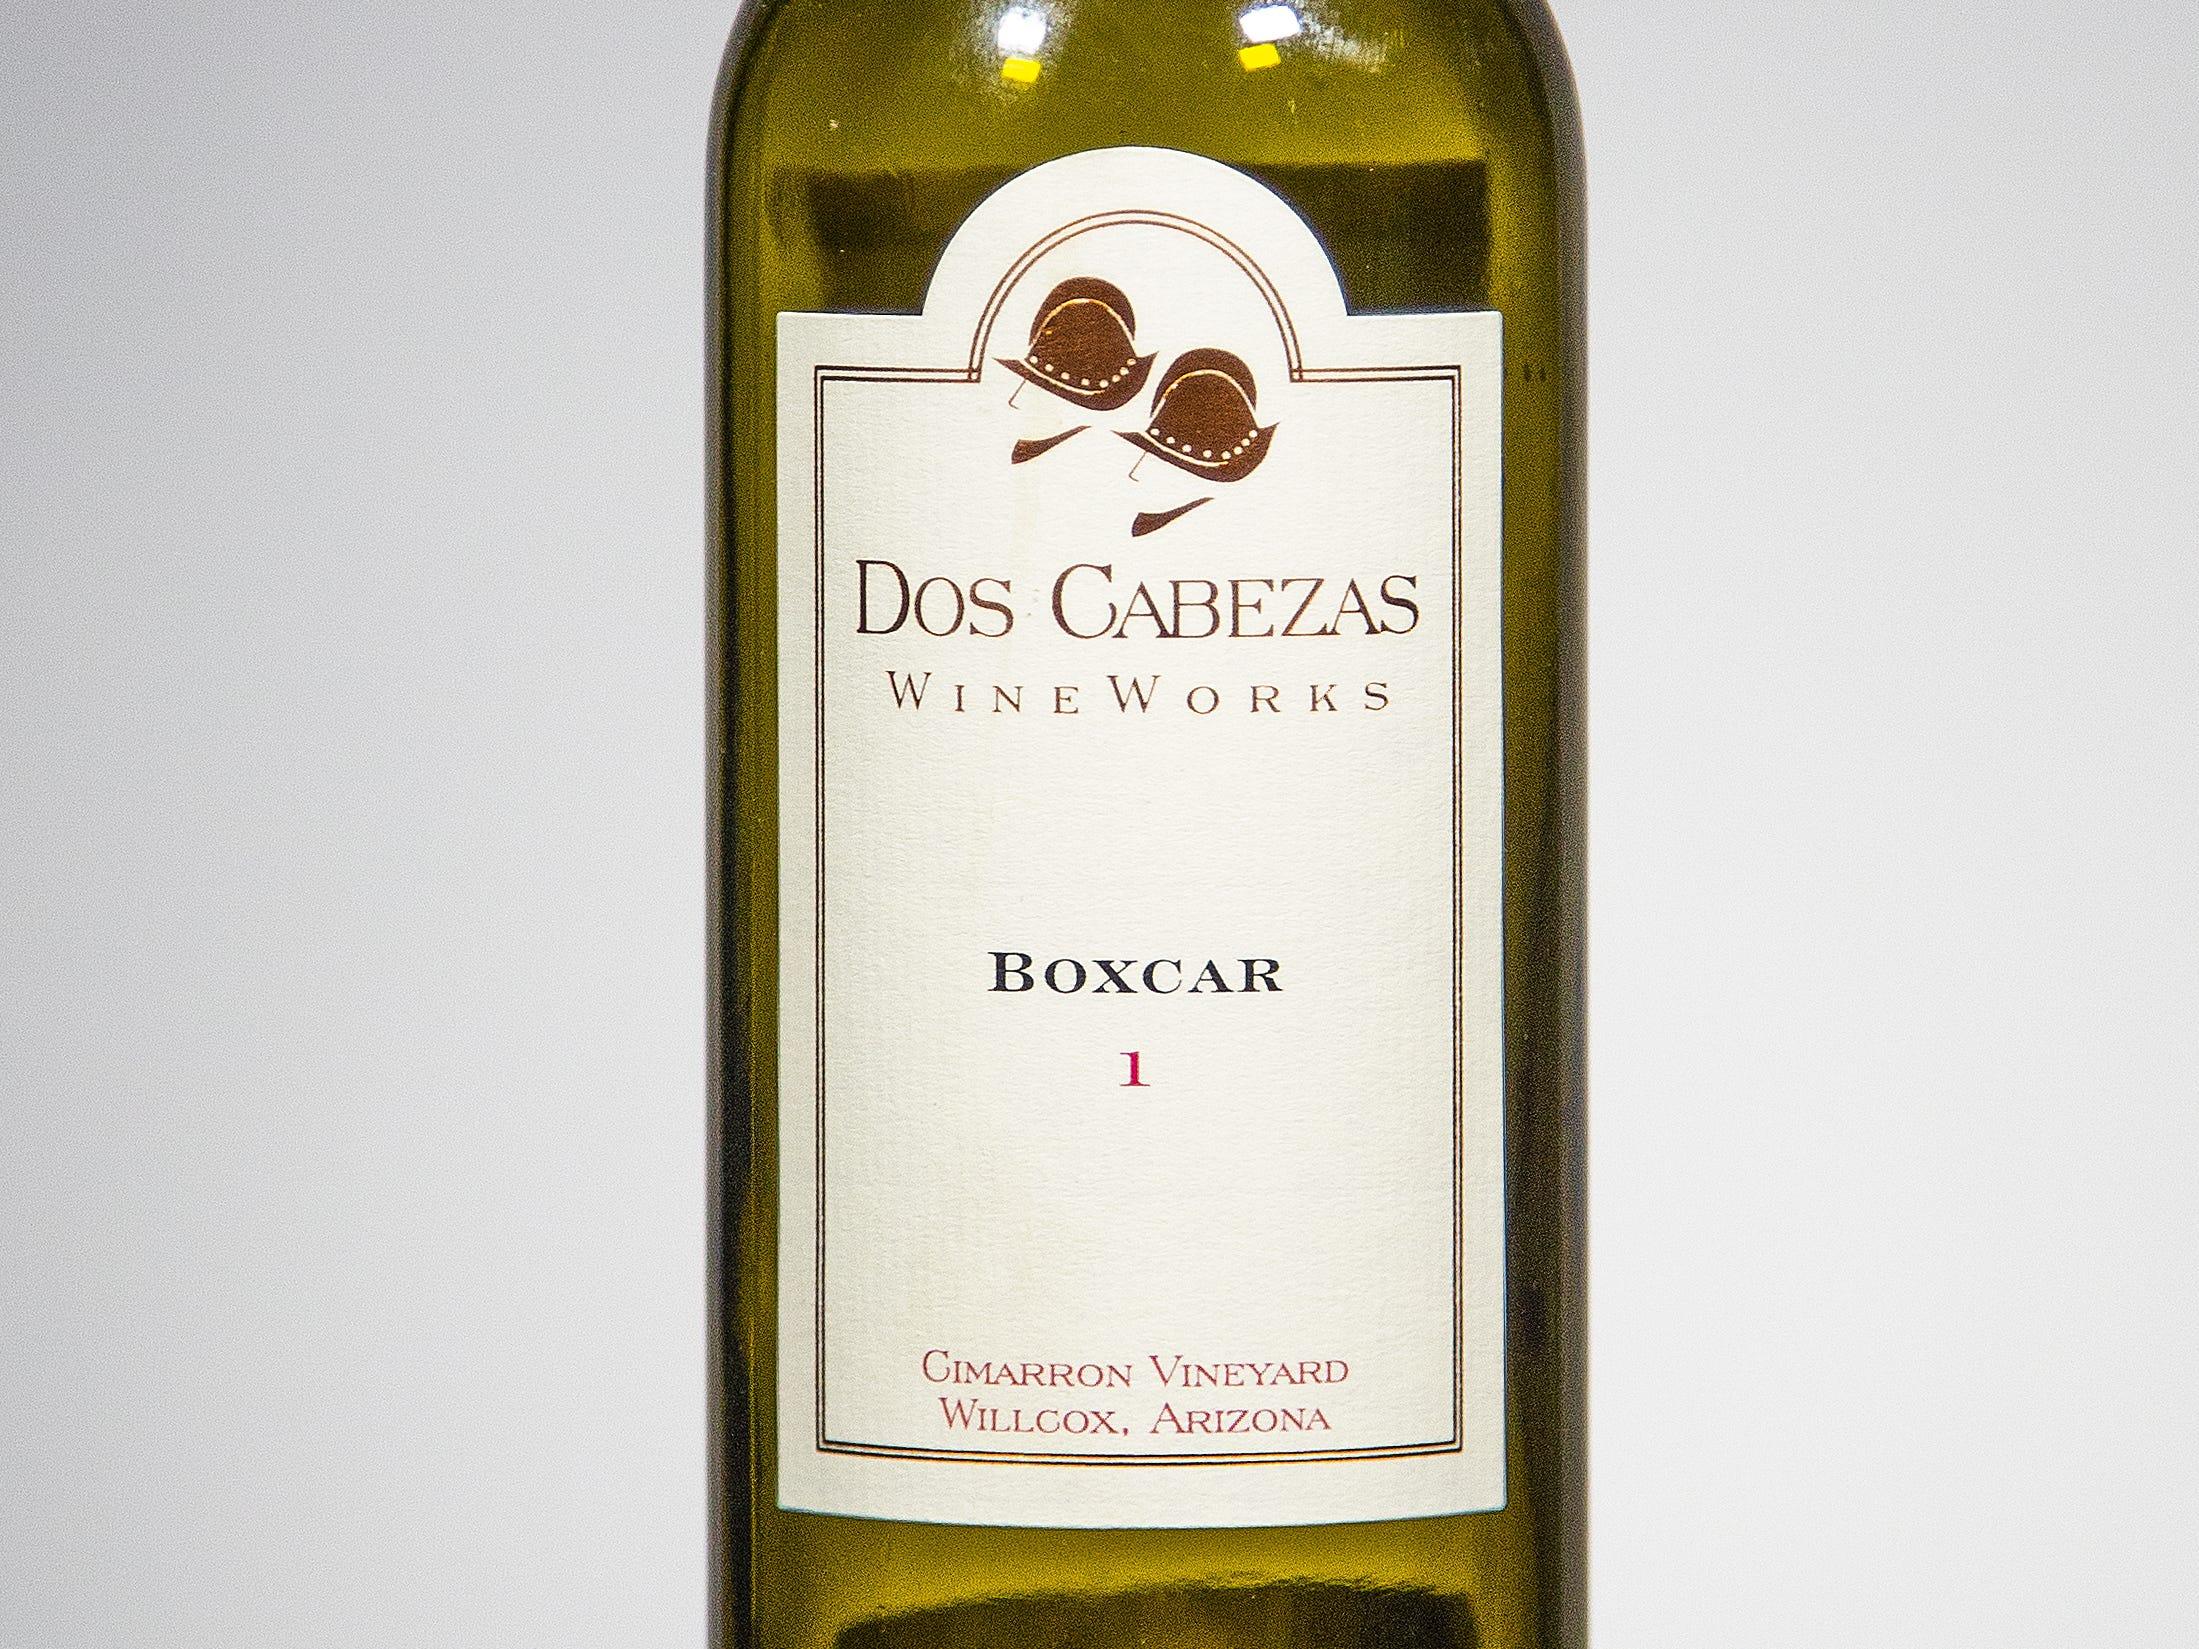 Best Port-style Dessert Wine: Dos Cabezas WineWorks Boxcar 1 non-vintage